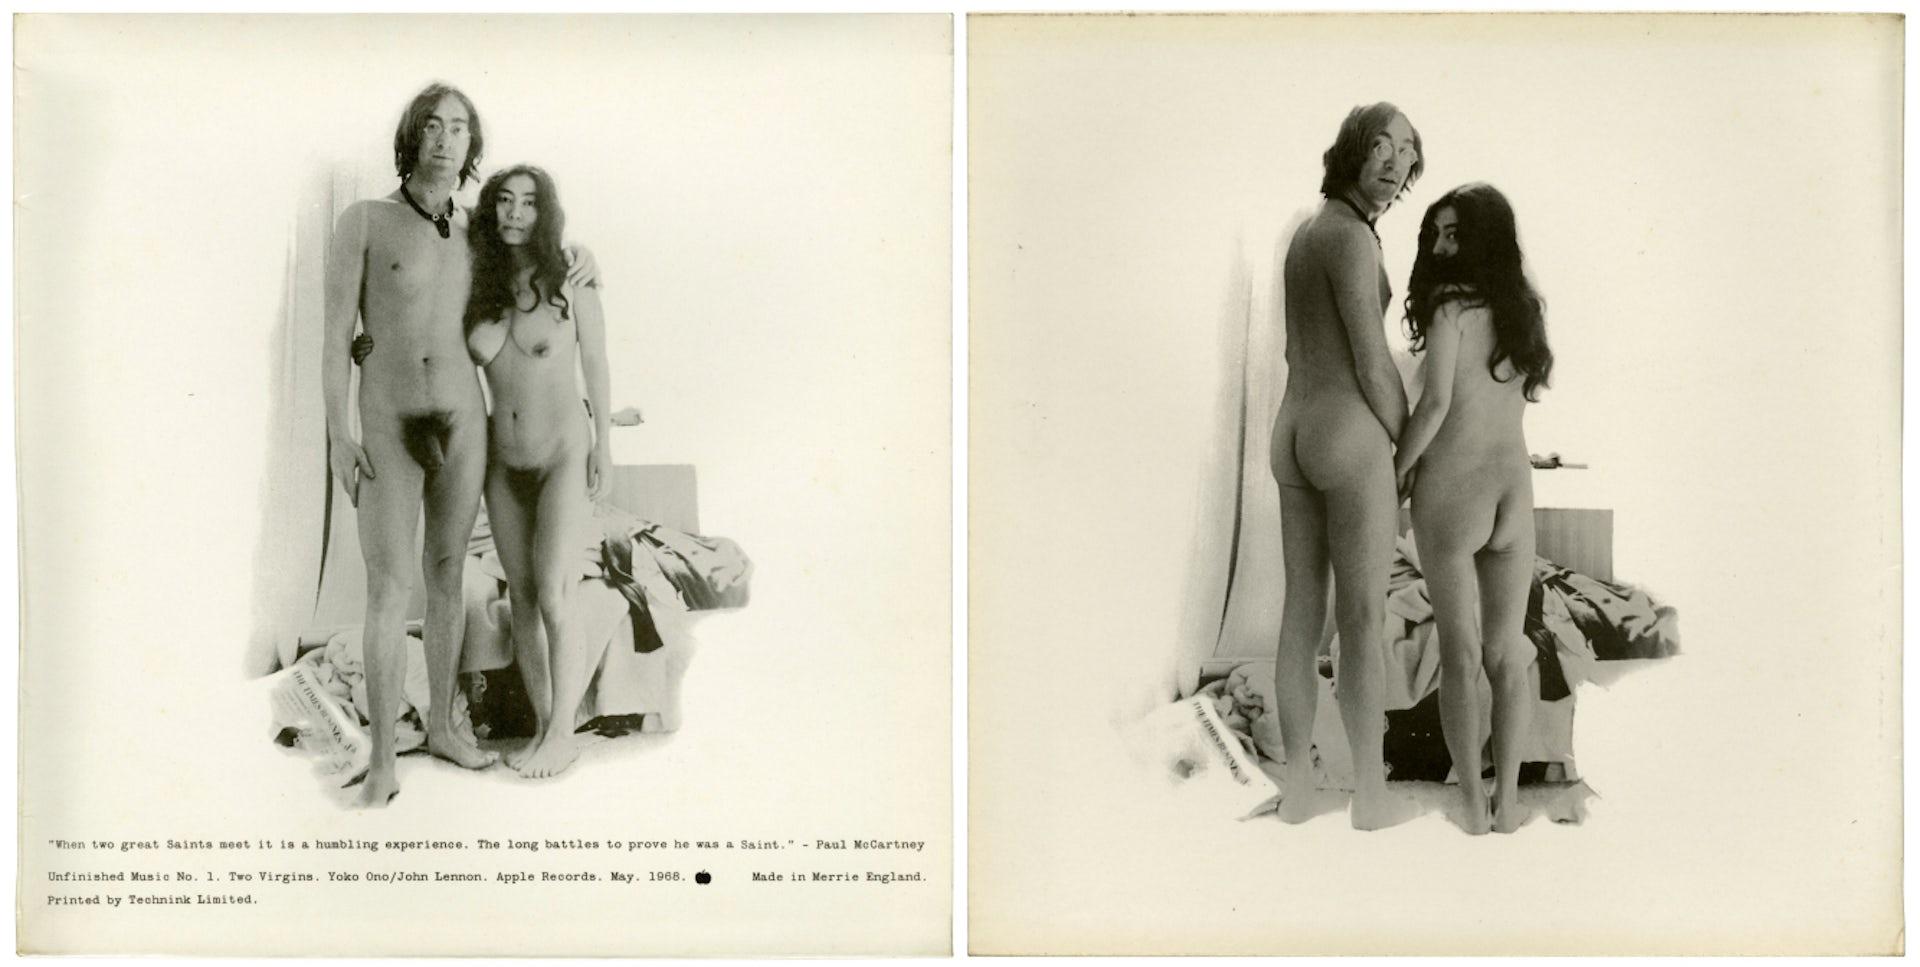 John lennon and yoko ono naked